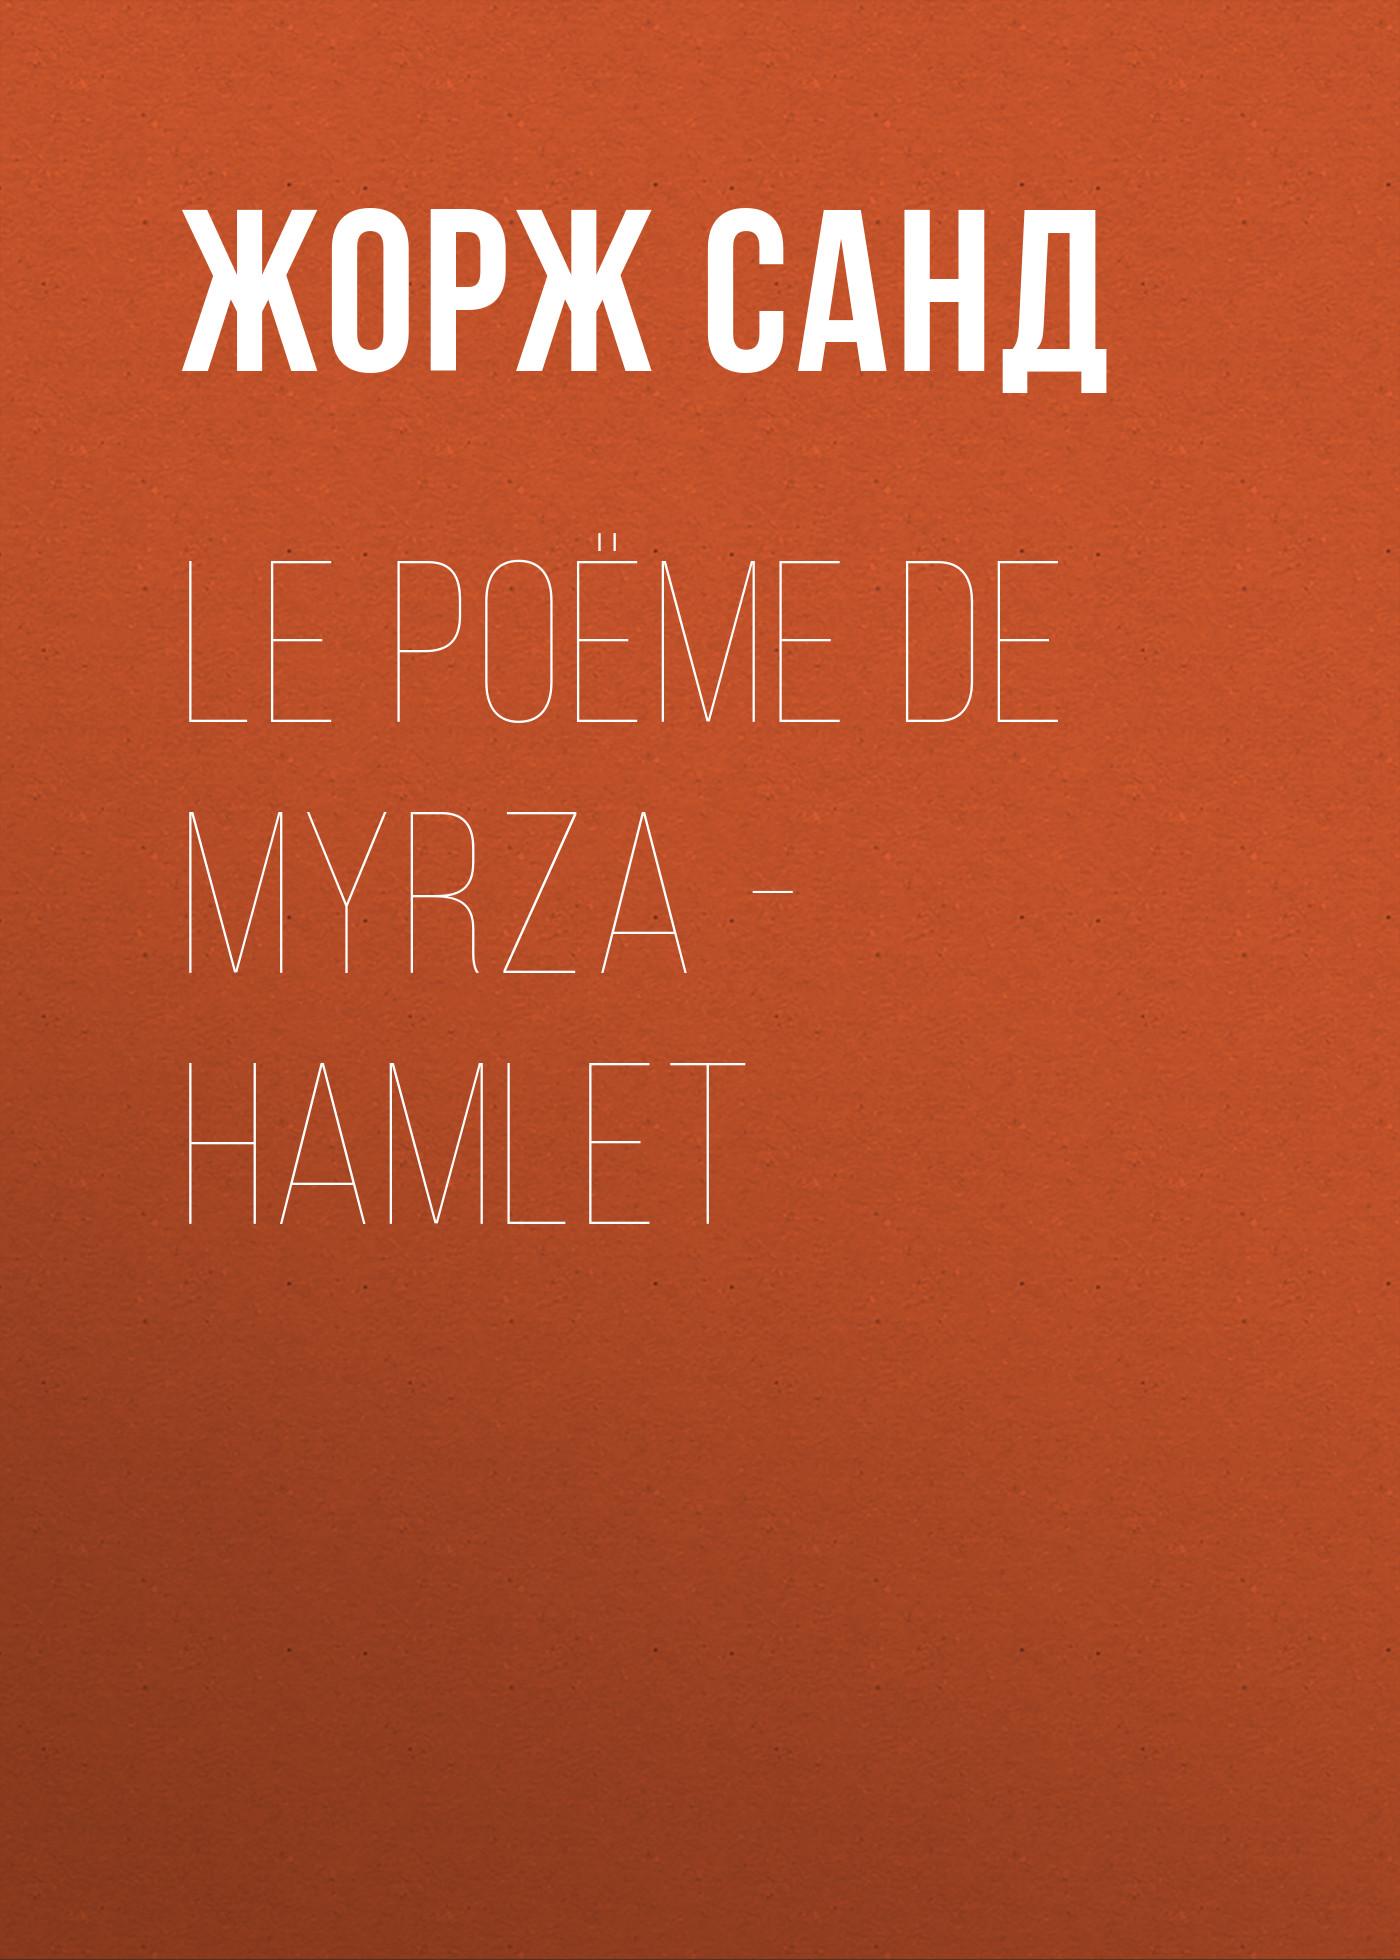 Жорж Санд Le poëme de Myrza - Hamlet wanted hamlet